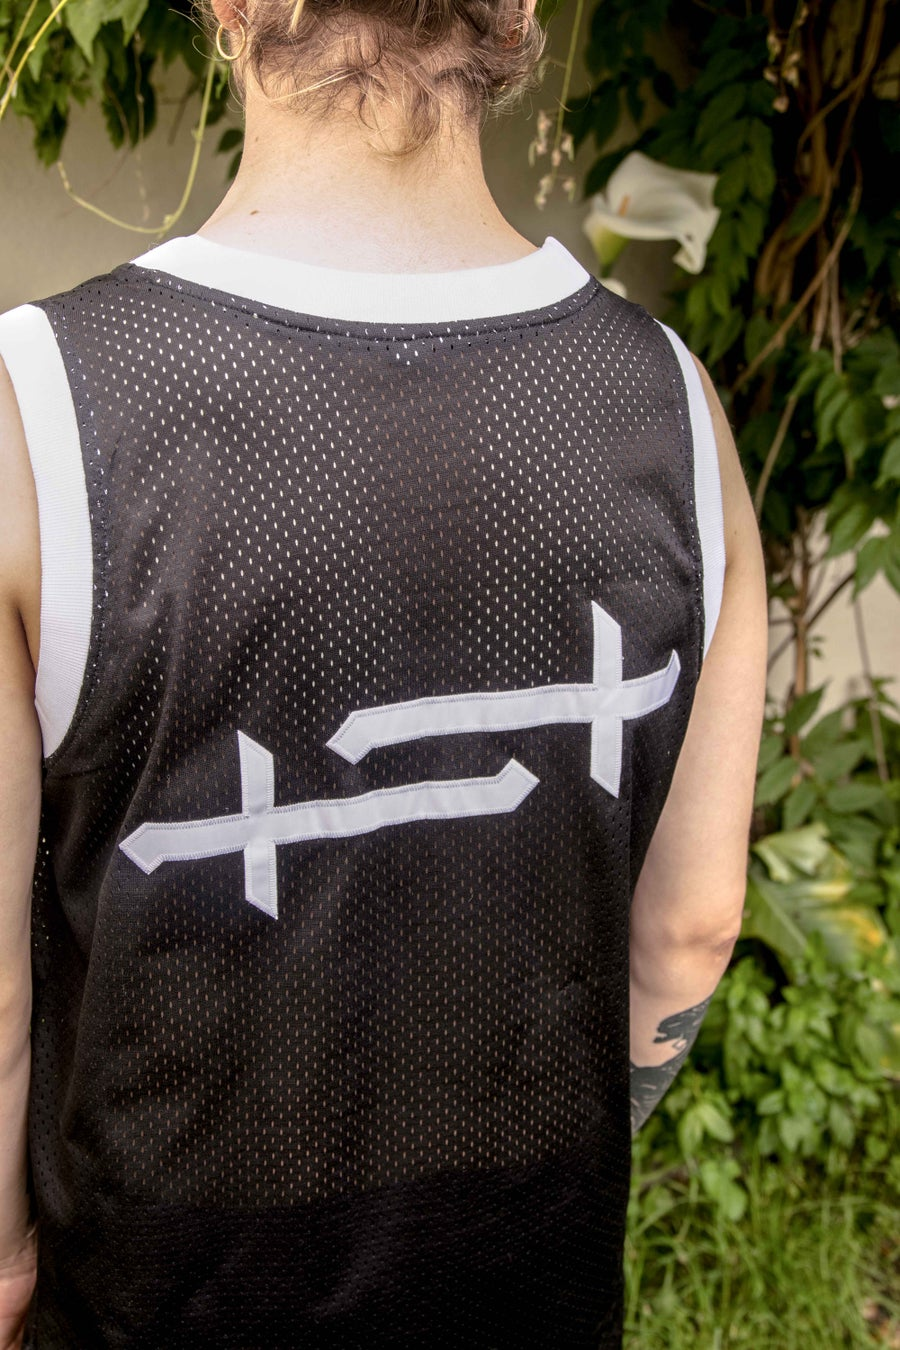 Image of Ghos†Coas† Basketball Jersey